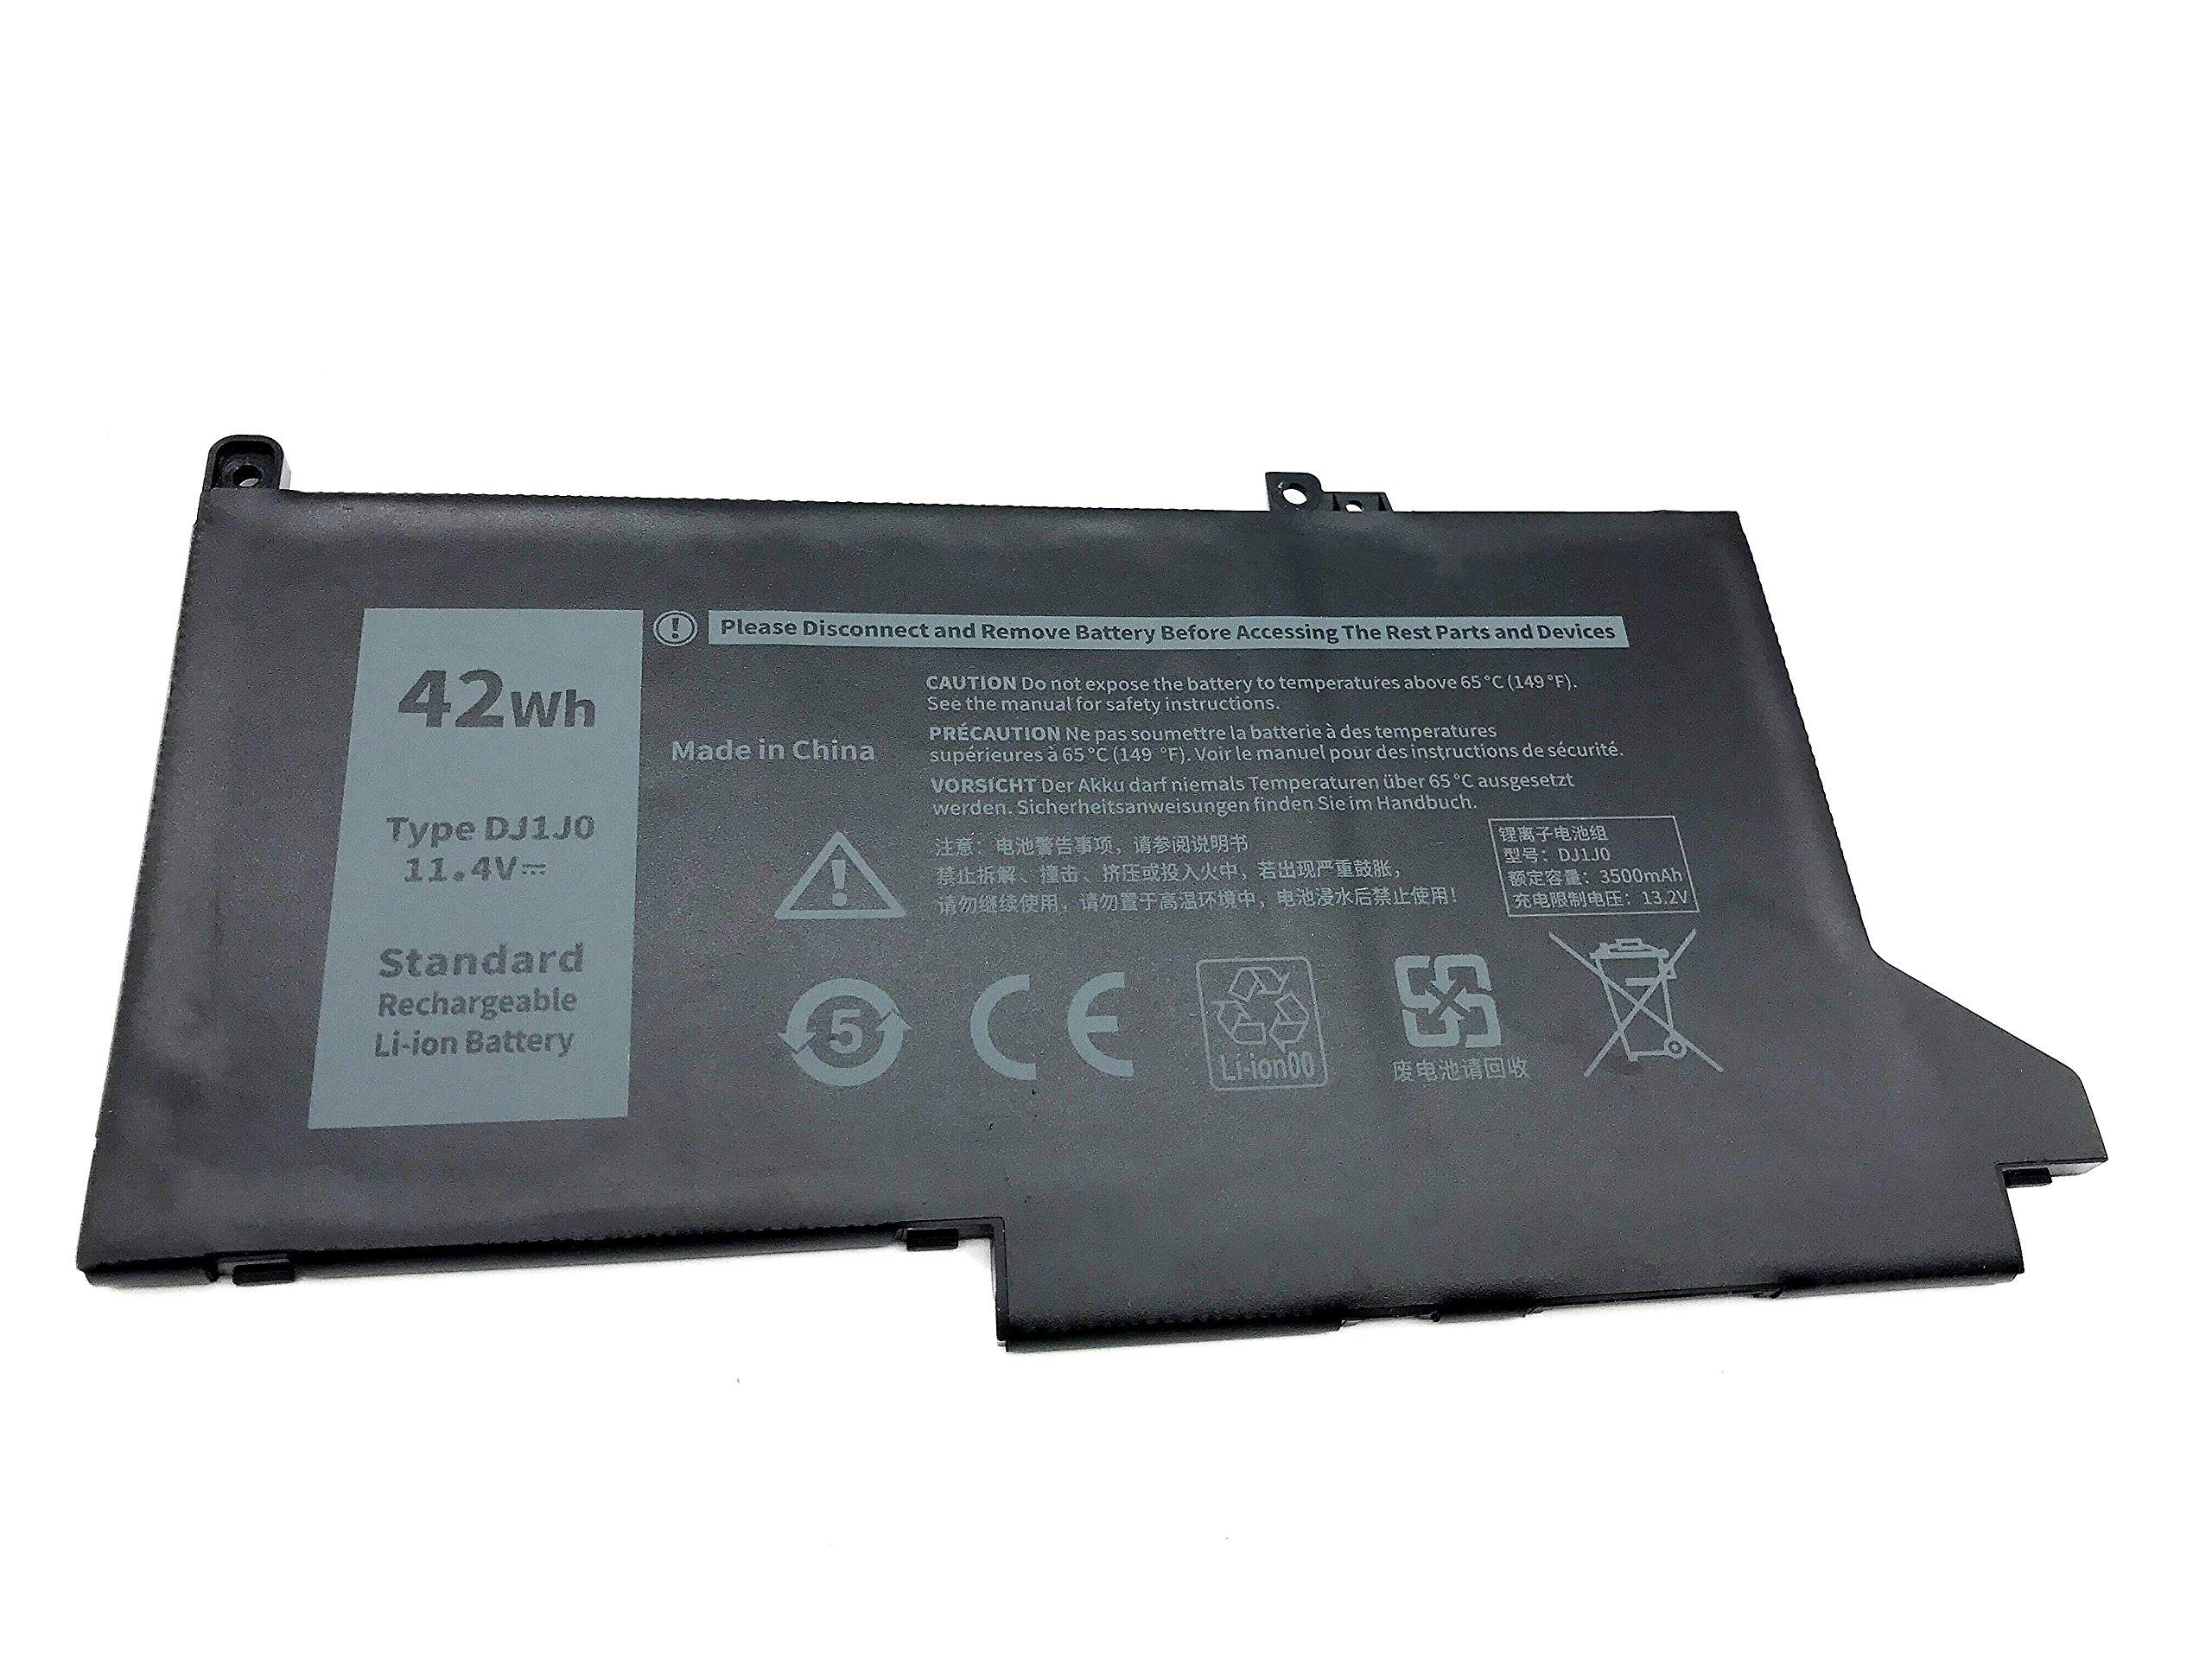 Bateria DJ1J0 11.4V 42Wh Dell Latitude 12 7000 7280 7480 Ser